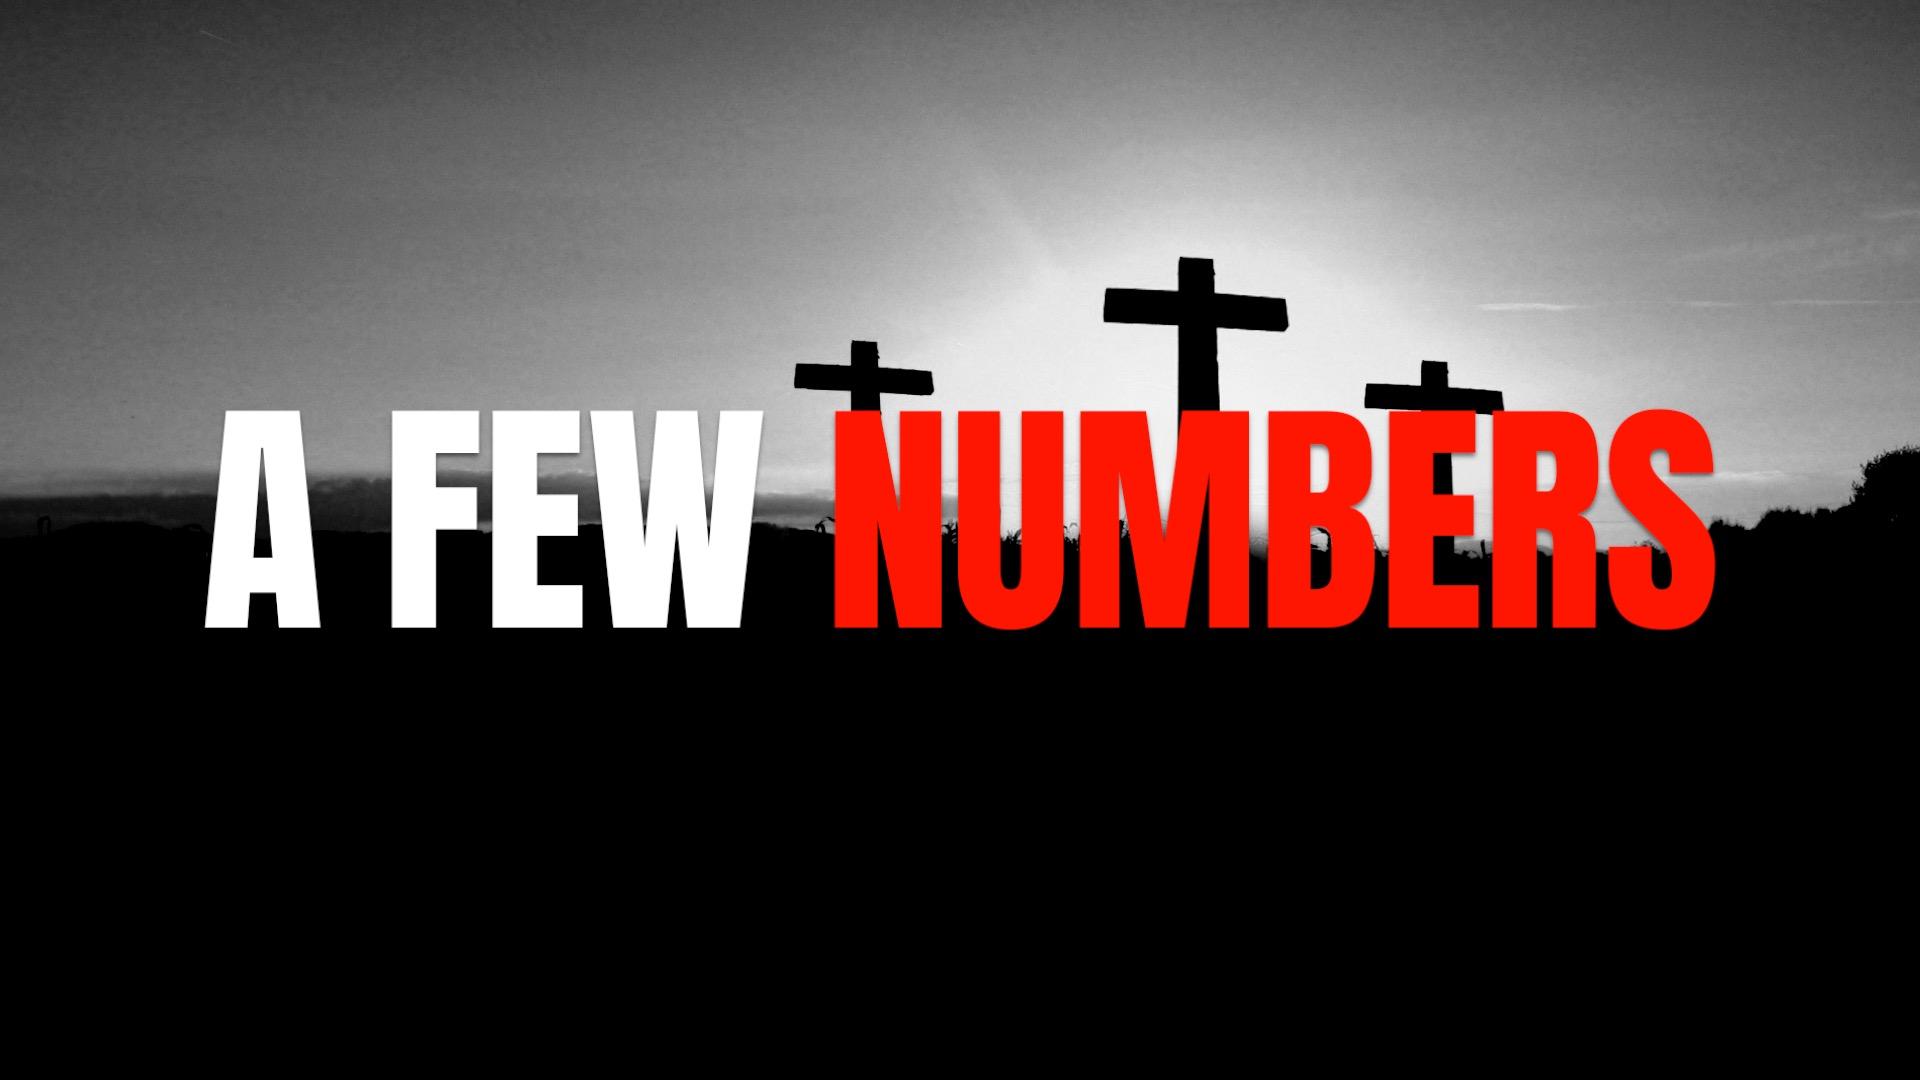 A Few Numbers